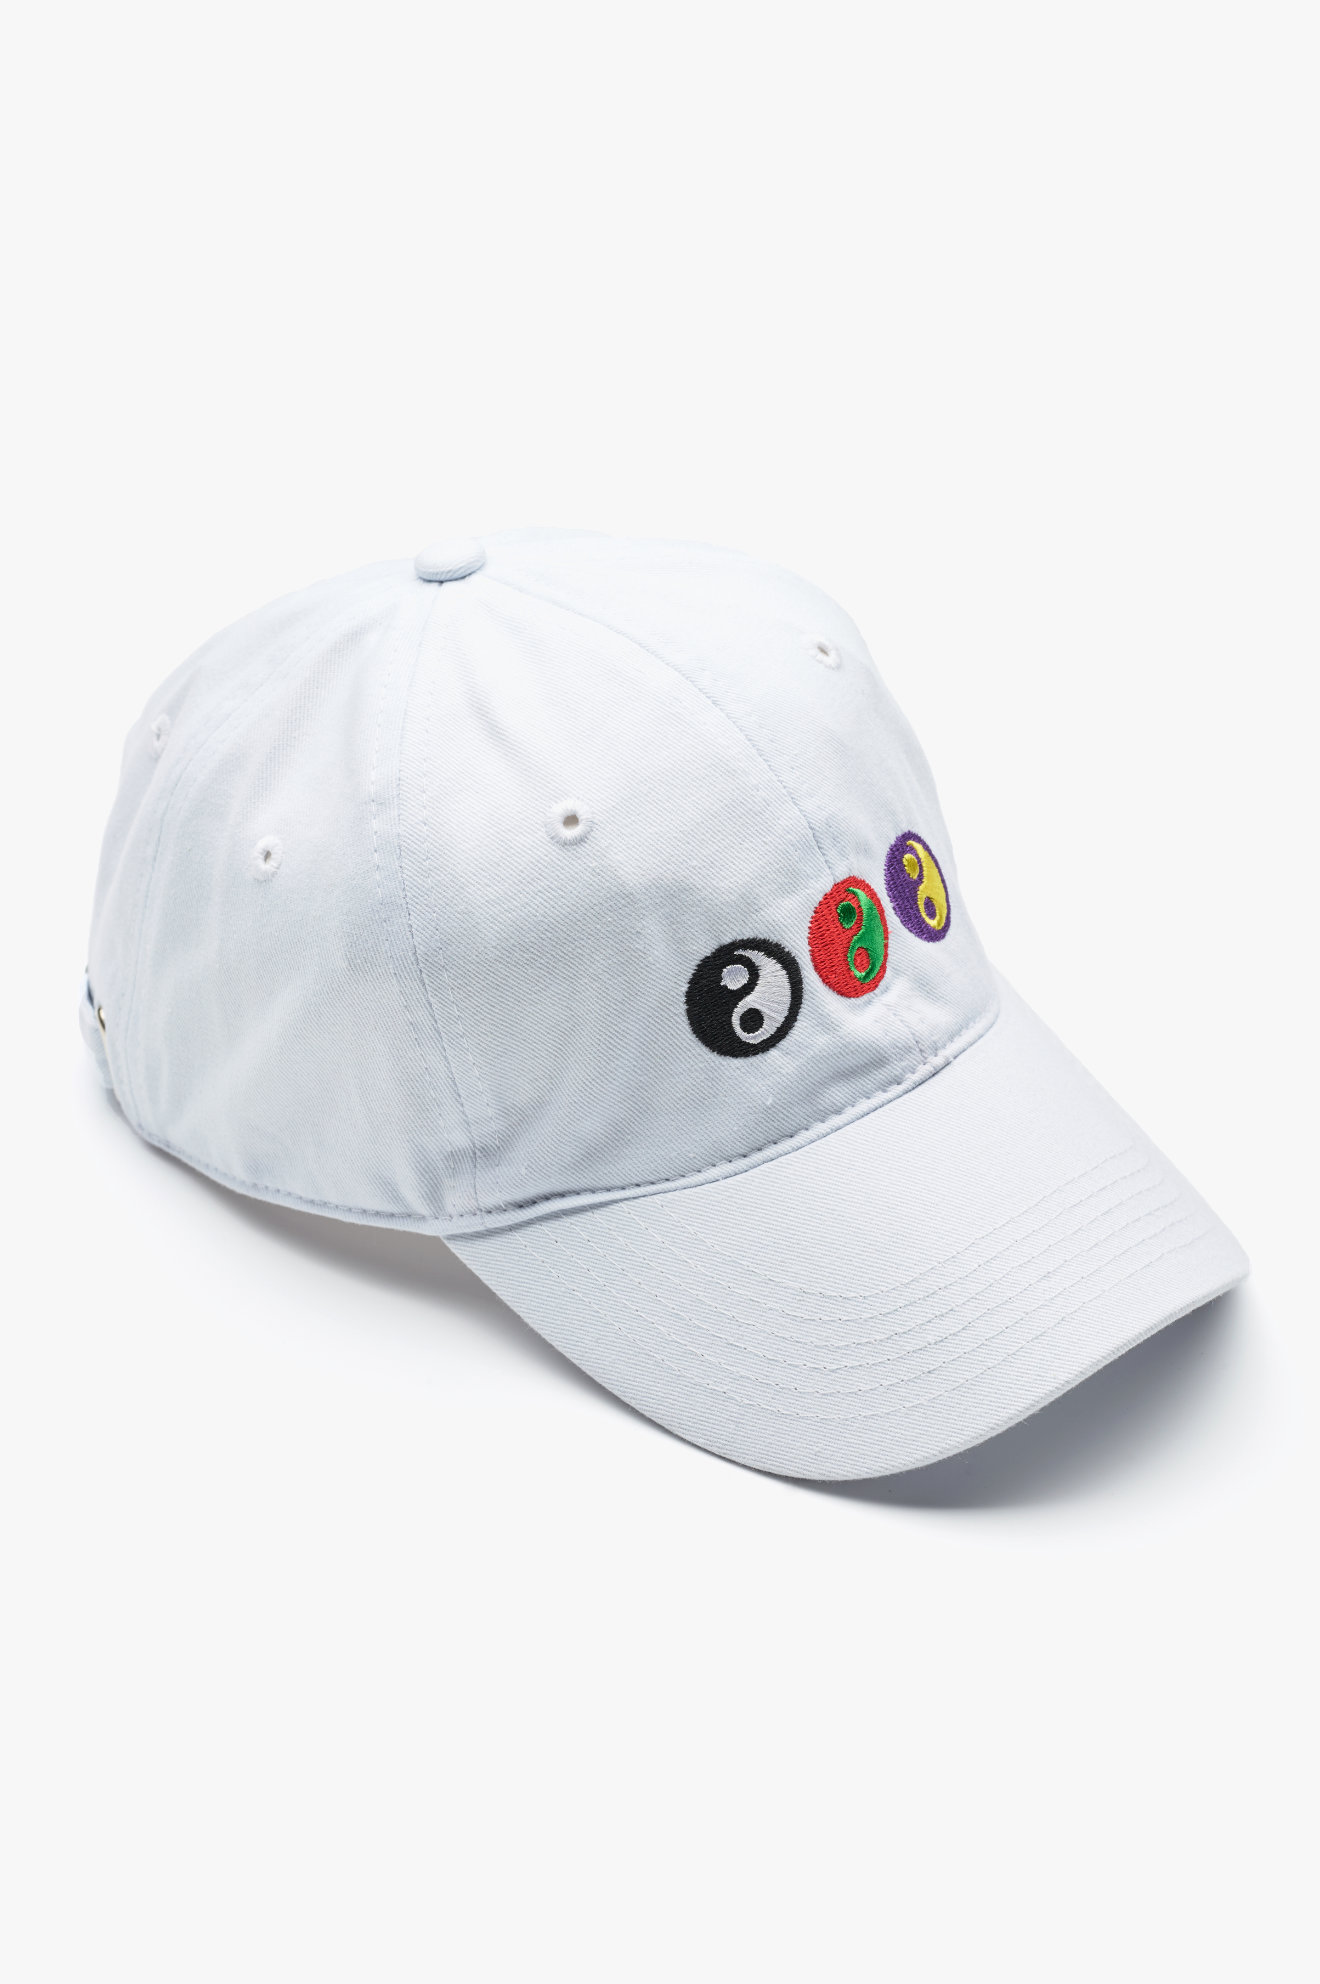 Yin Yang Baseball Cap White